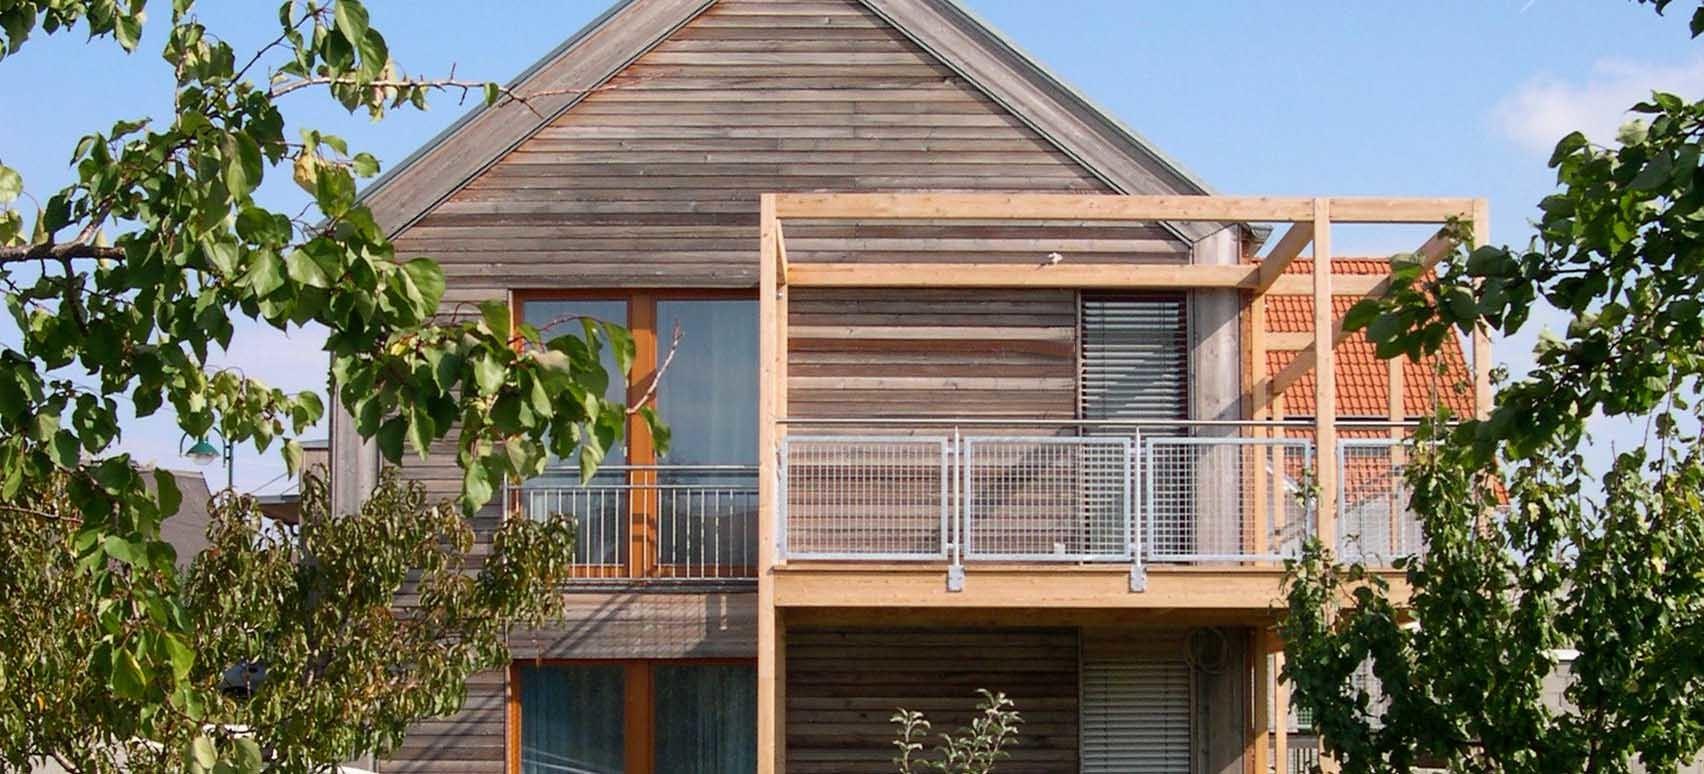 Holz verändert sich - Qualität bleibt